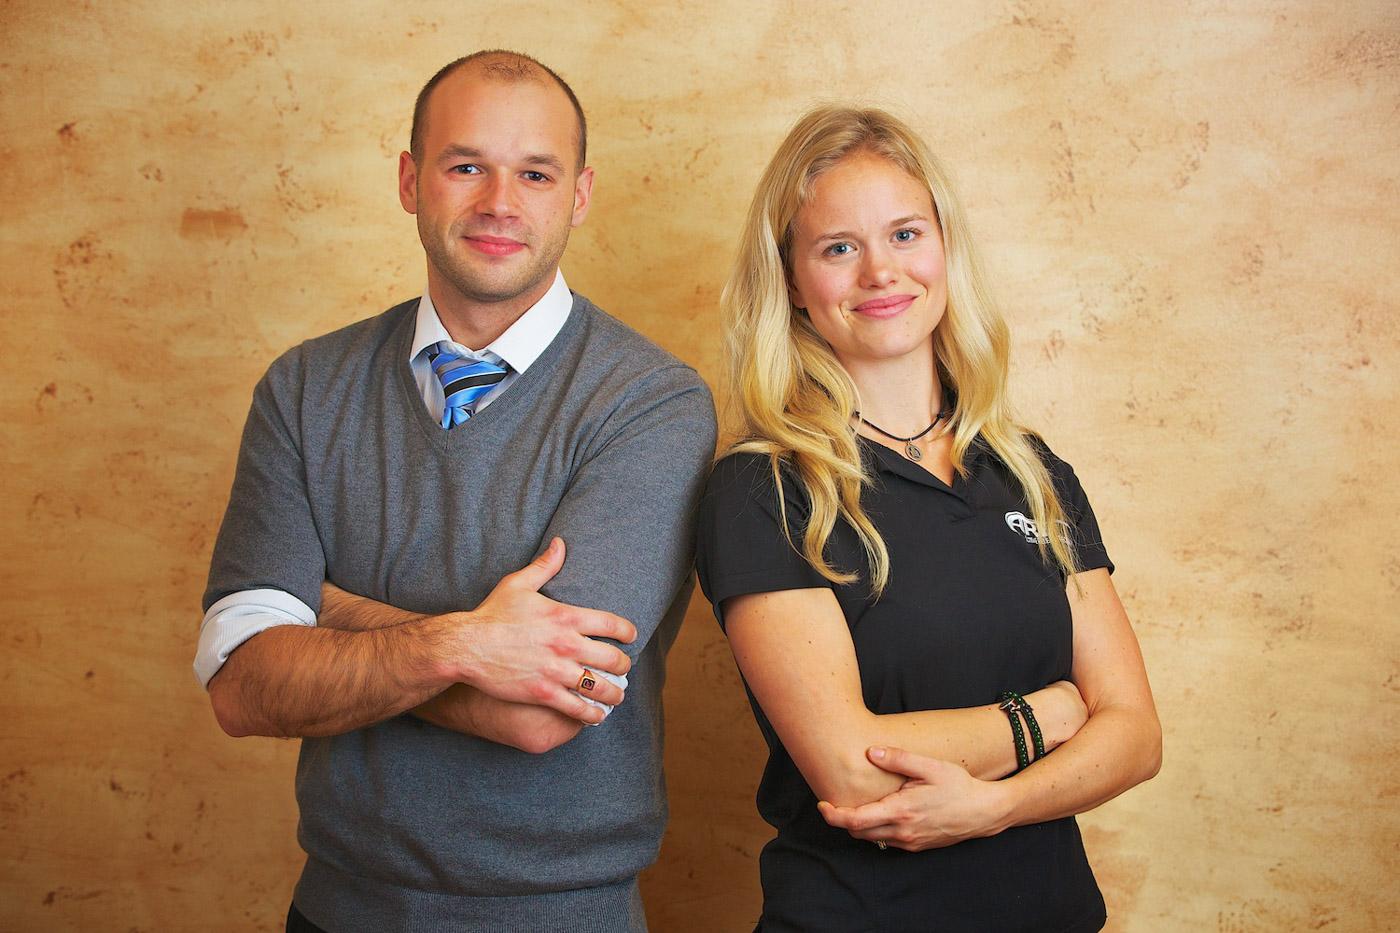 Minneapolis Business Portraits